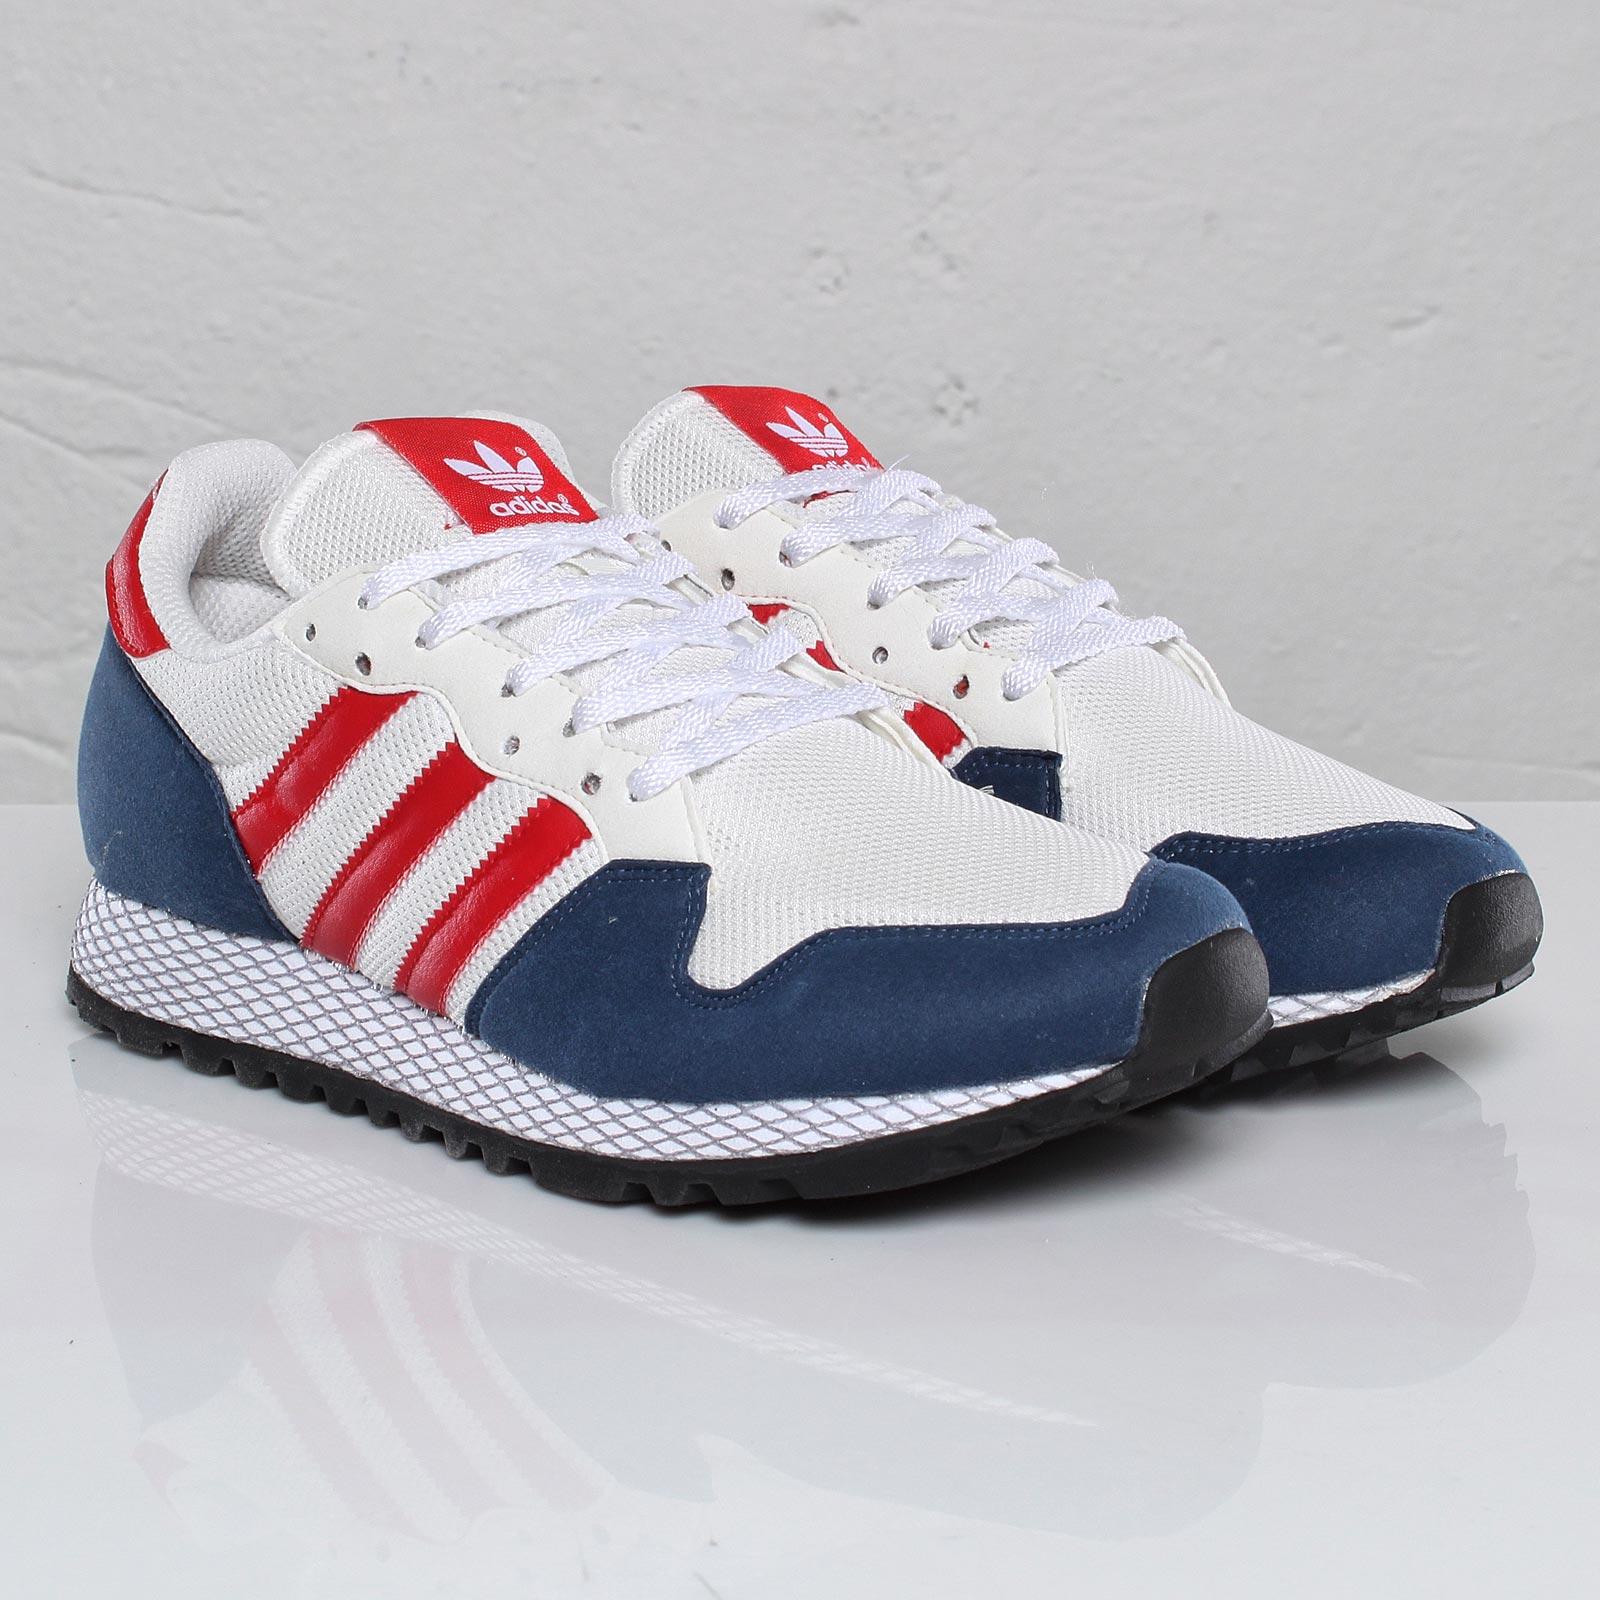 Adidas Zx 380 Mens Blue All White Adidas Skate Shoes